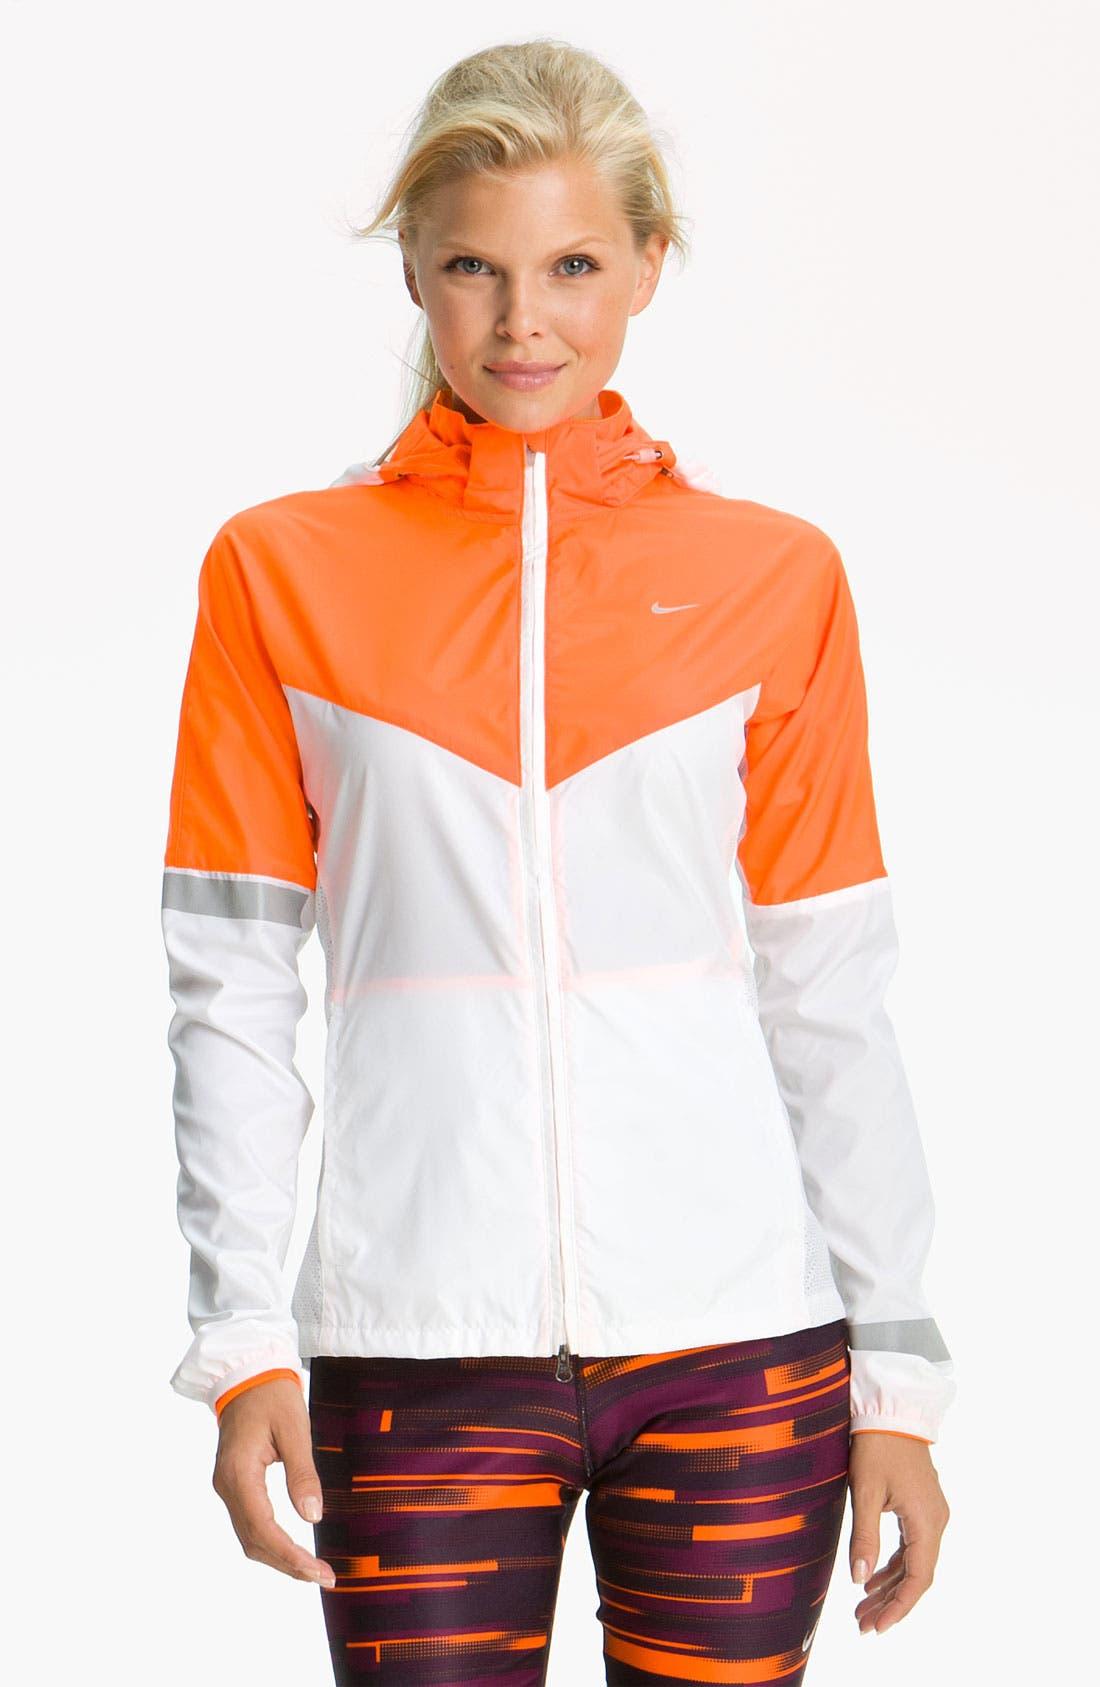 Alternate Image 1 Selected - Nike 'Vapor' Running Jacket